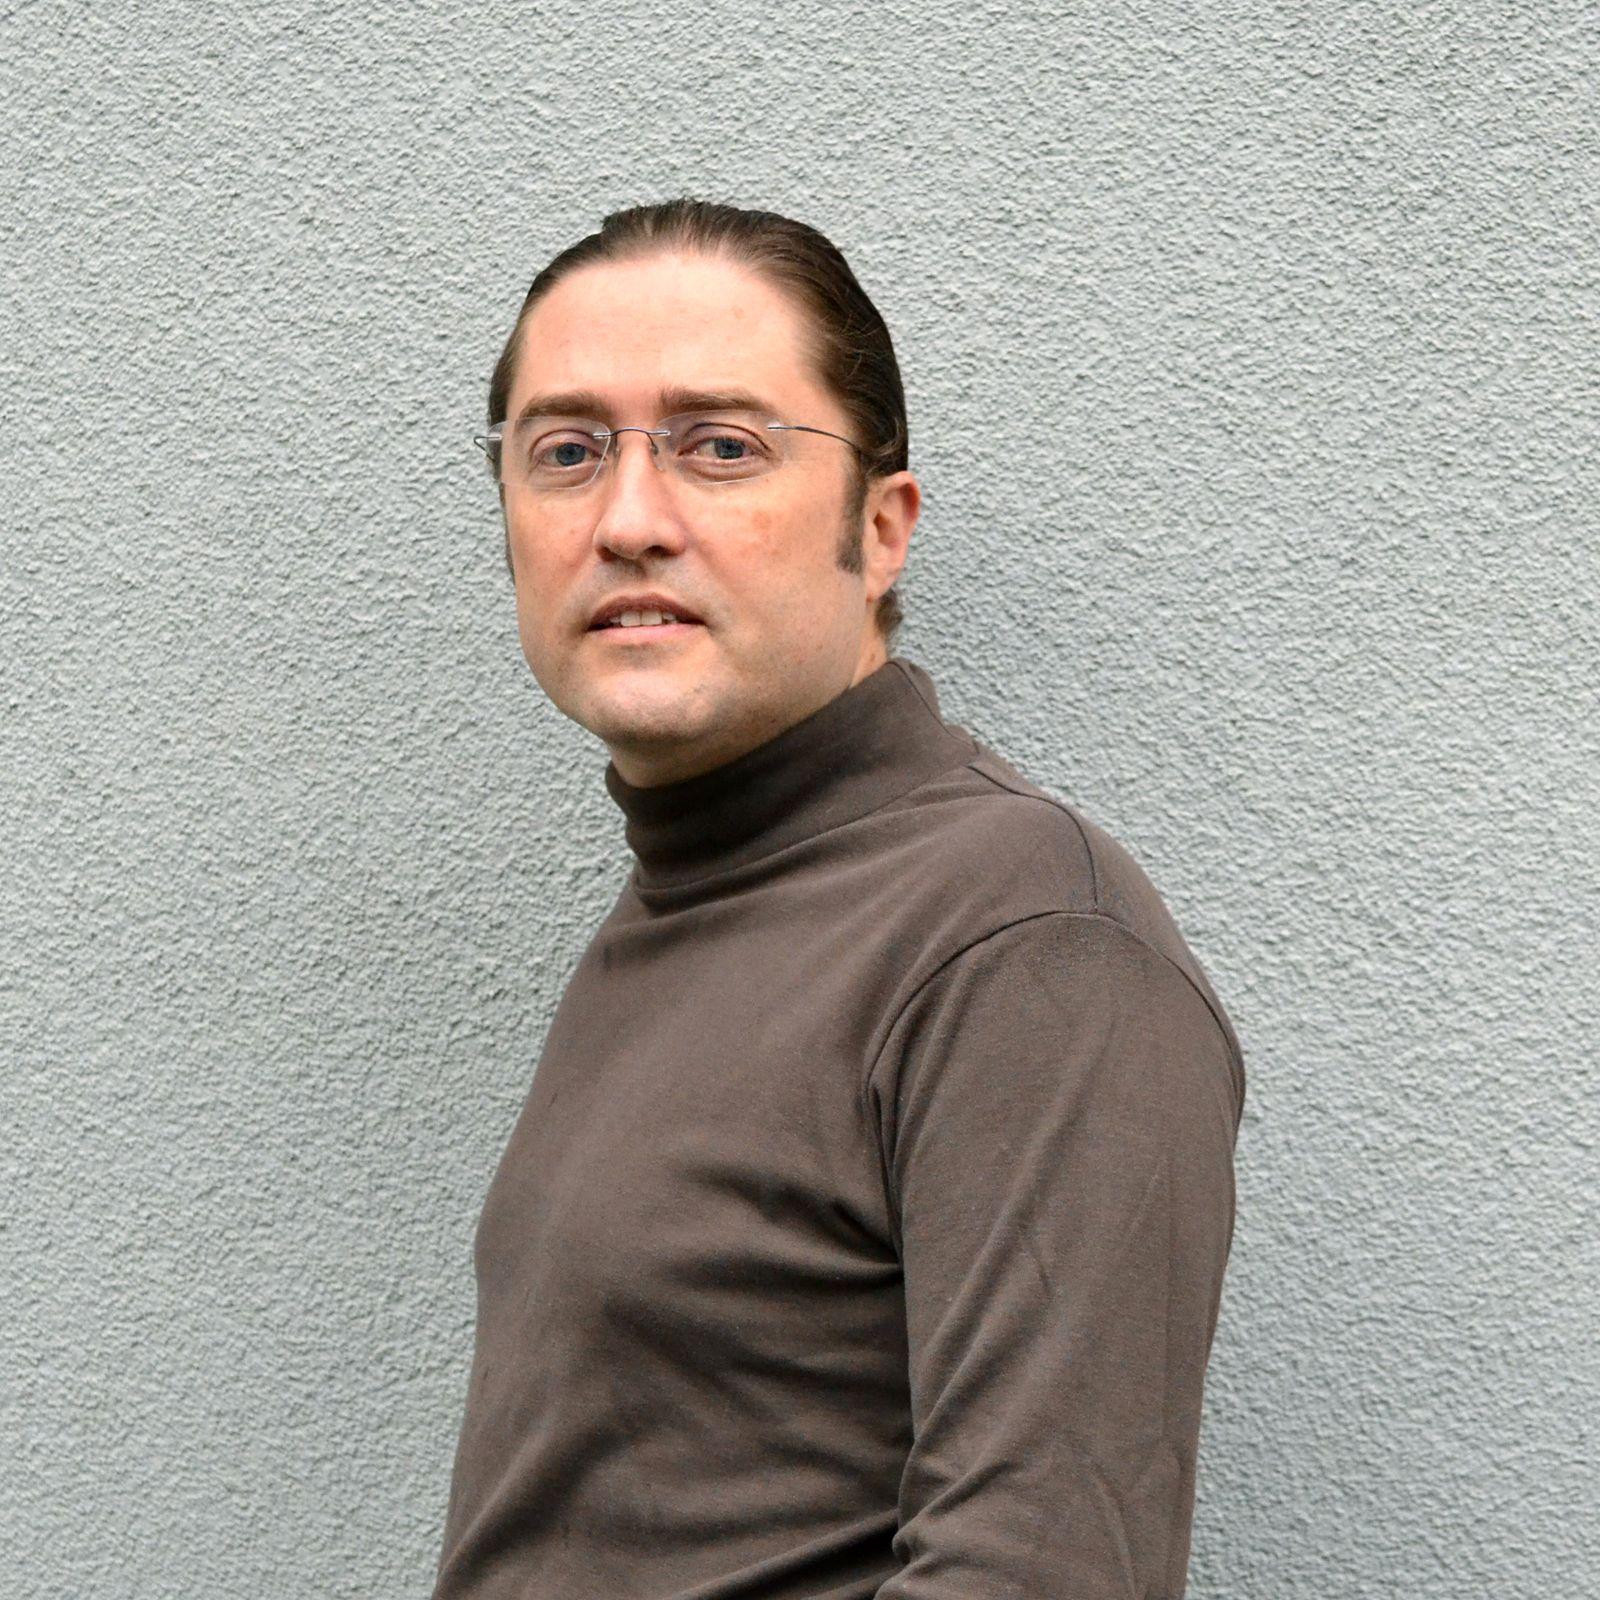 Fernando Fastoso